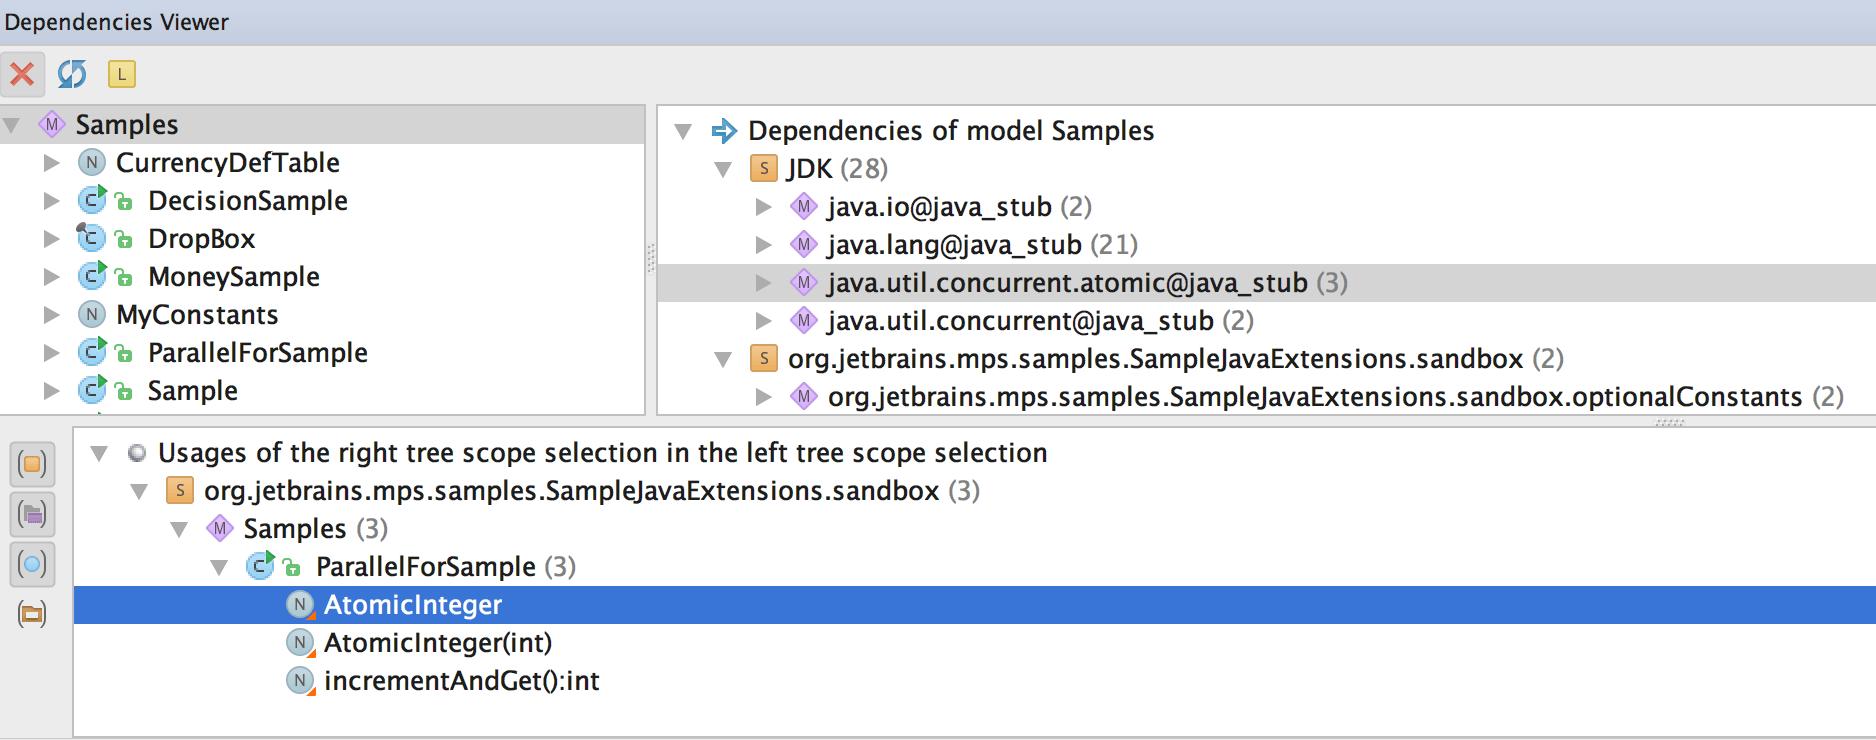 Dependencies Analyzer tool windowu